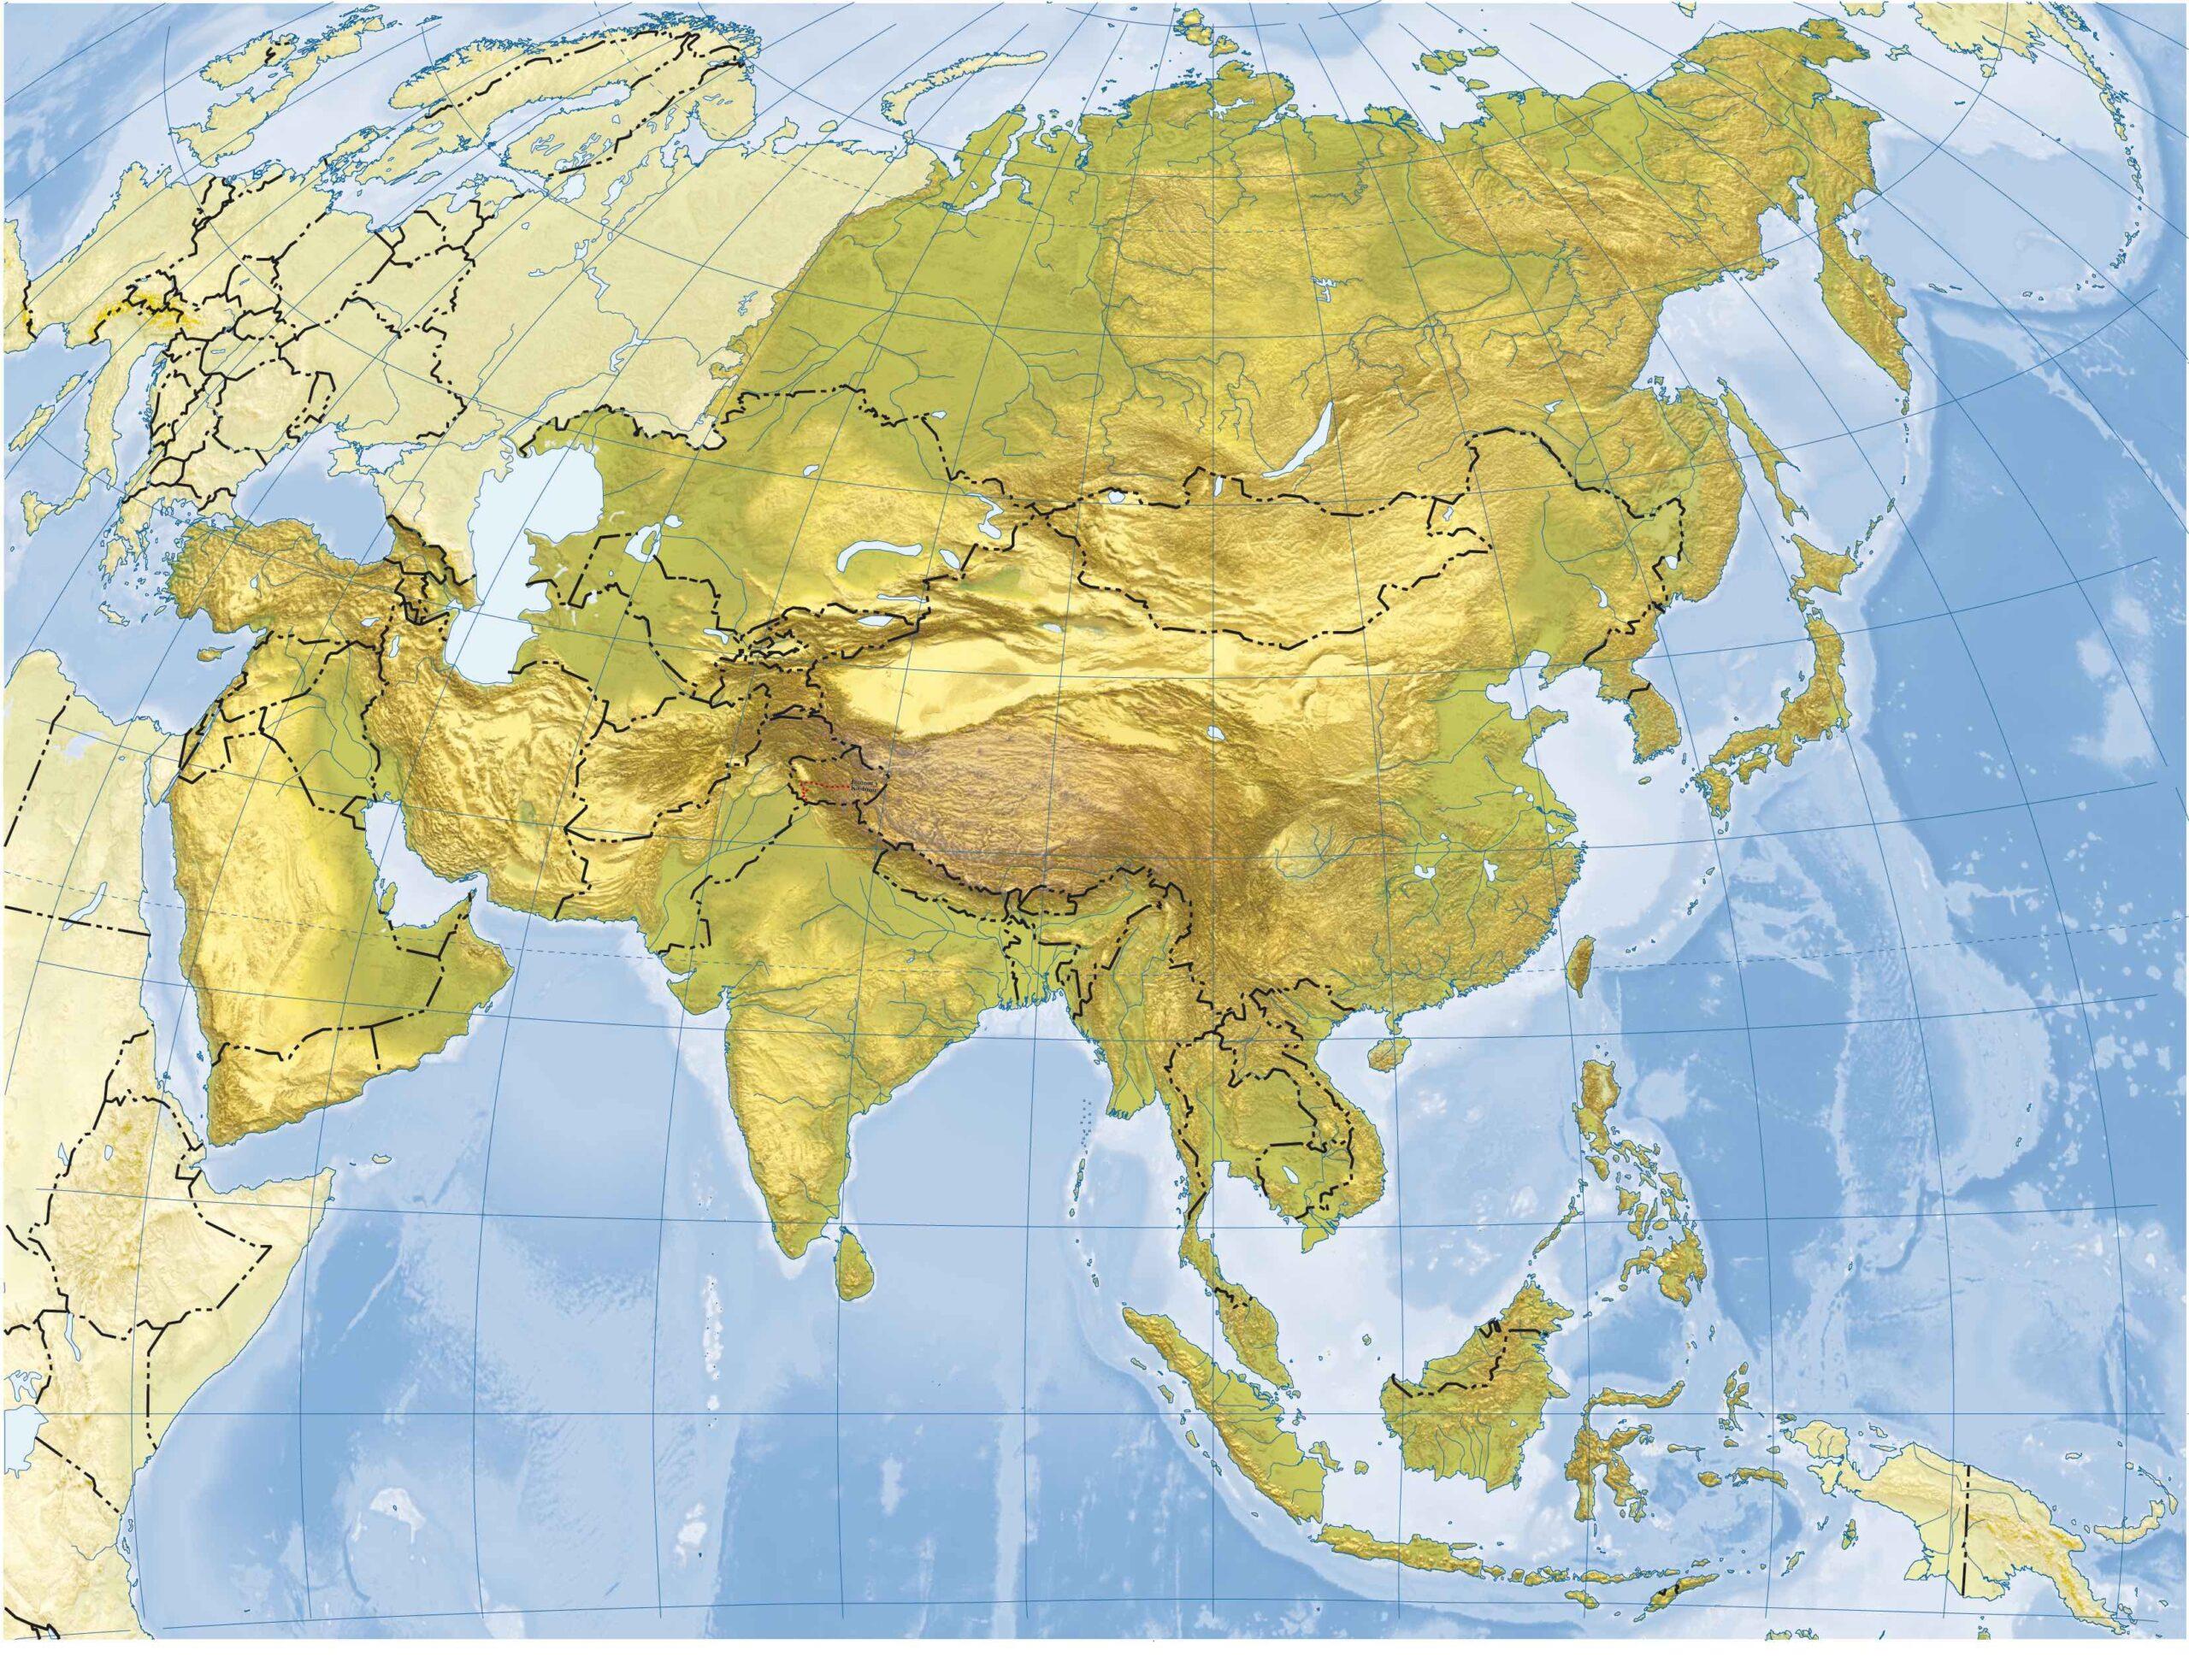 Mapa físico Asia mudo